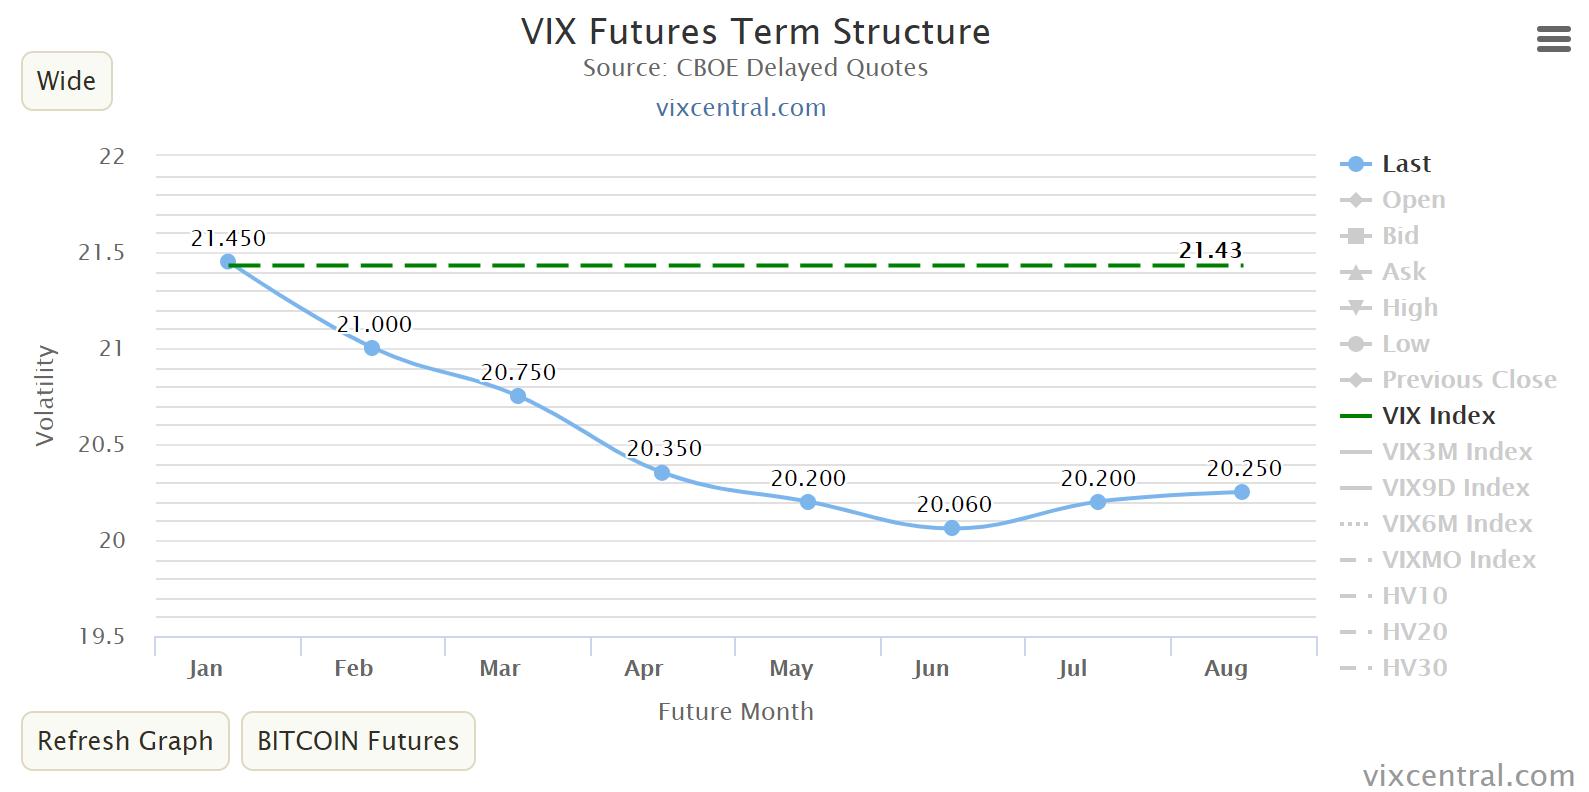 Backwardation in den VIX-Futures - VXX